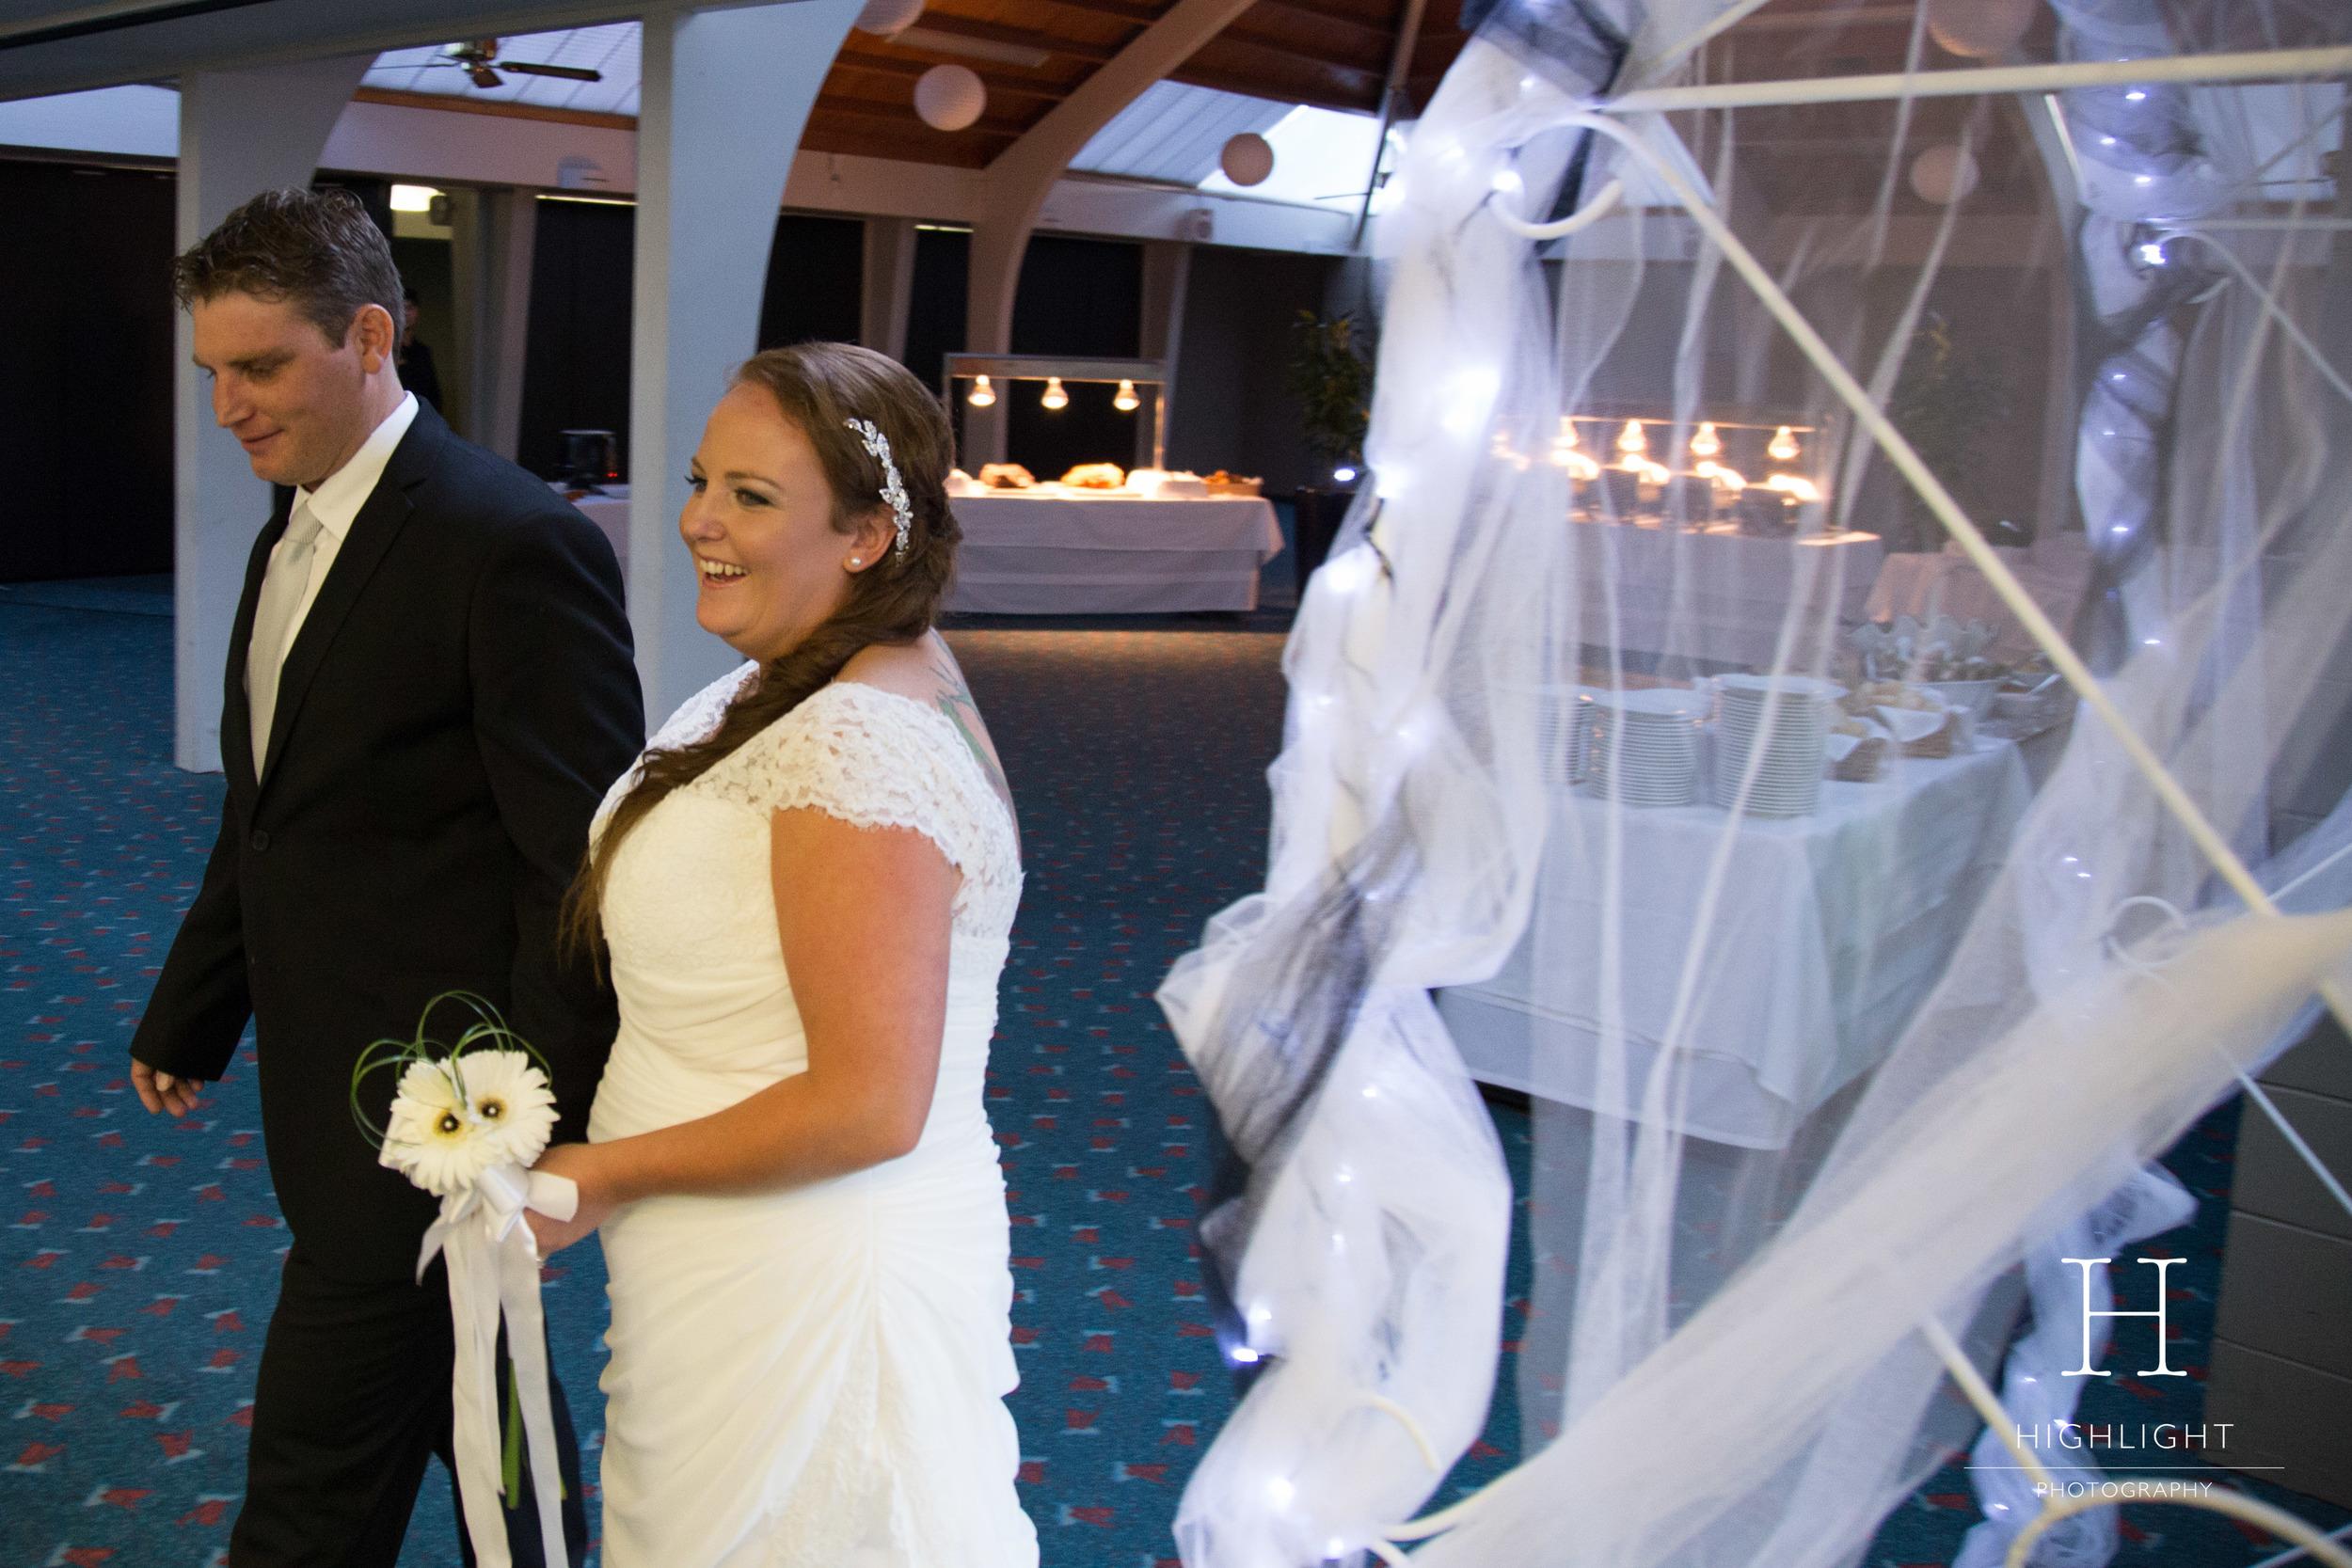 highlight-wedding-photography_new-zealand.jpg